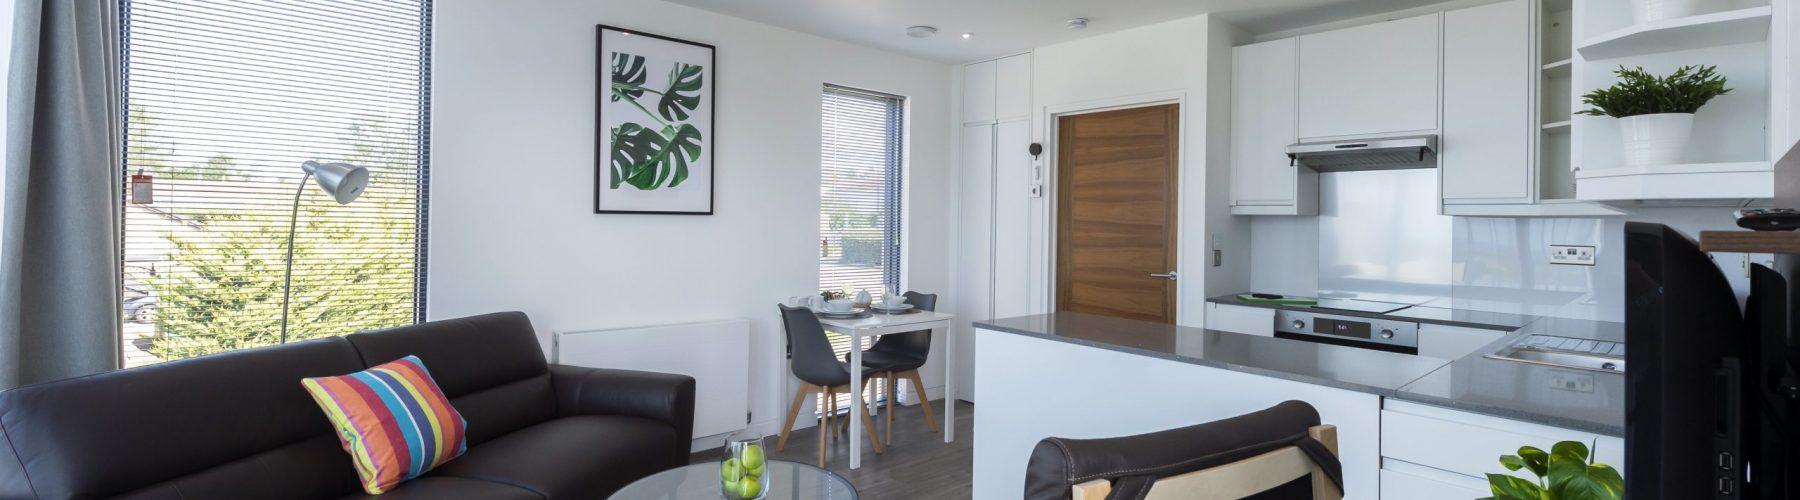 Apartrooms No 10 White_9